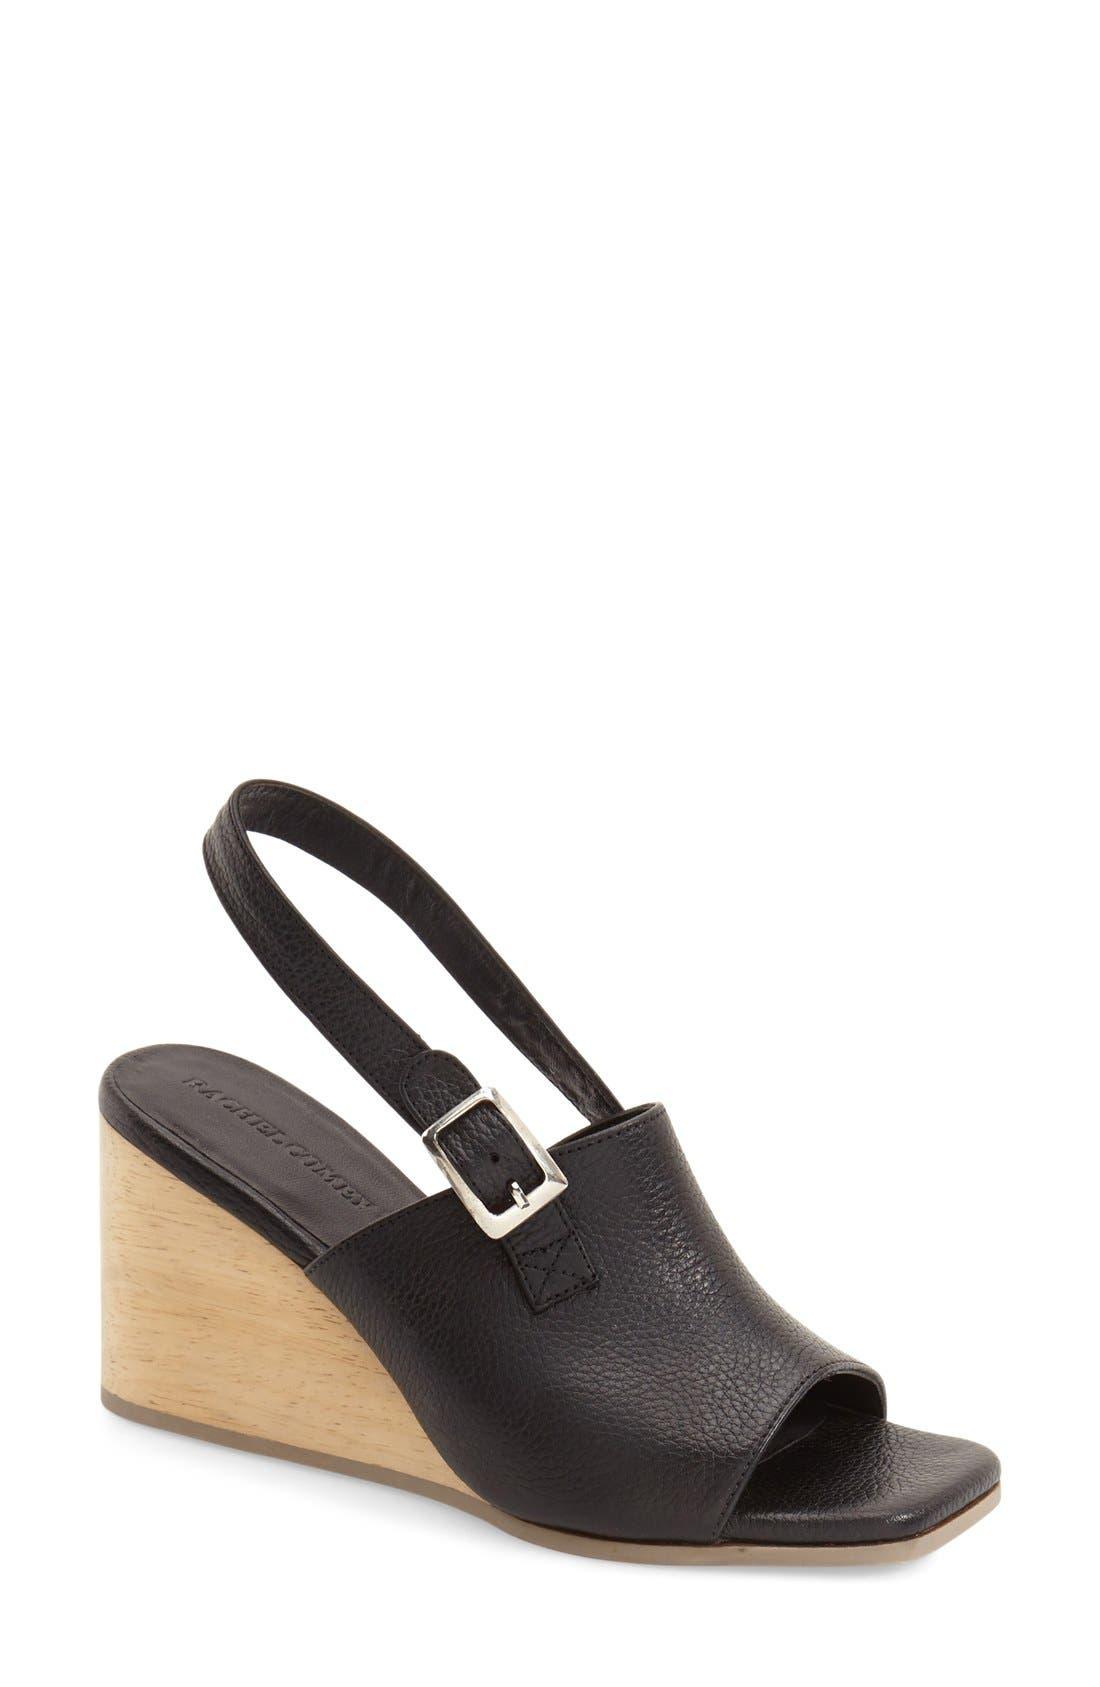 Alternate Image 1 Selected - Rachel Comey 'Vista' Wedge Sandal (Women)